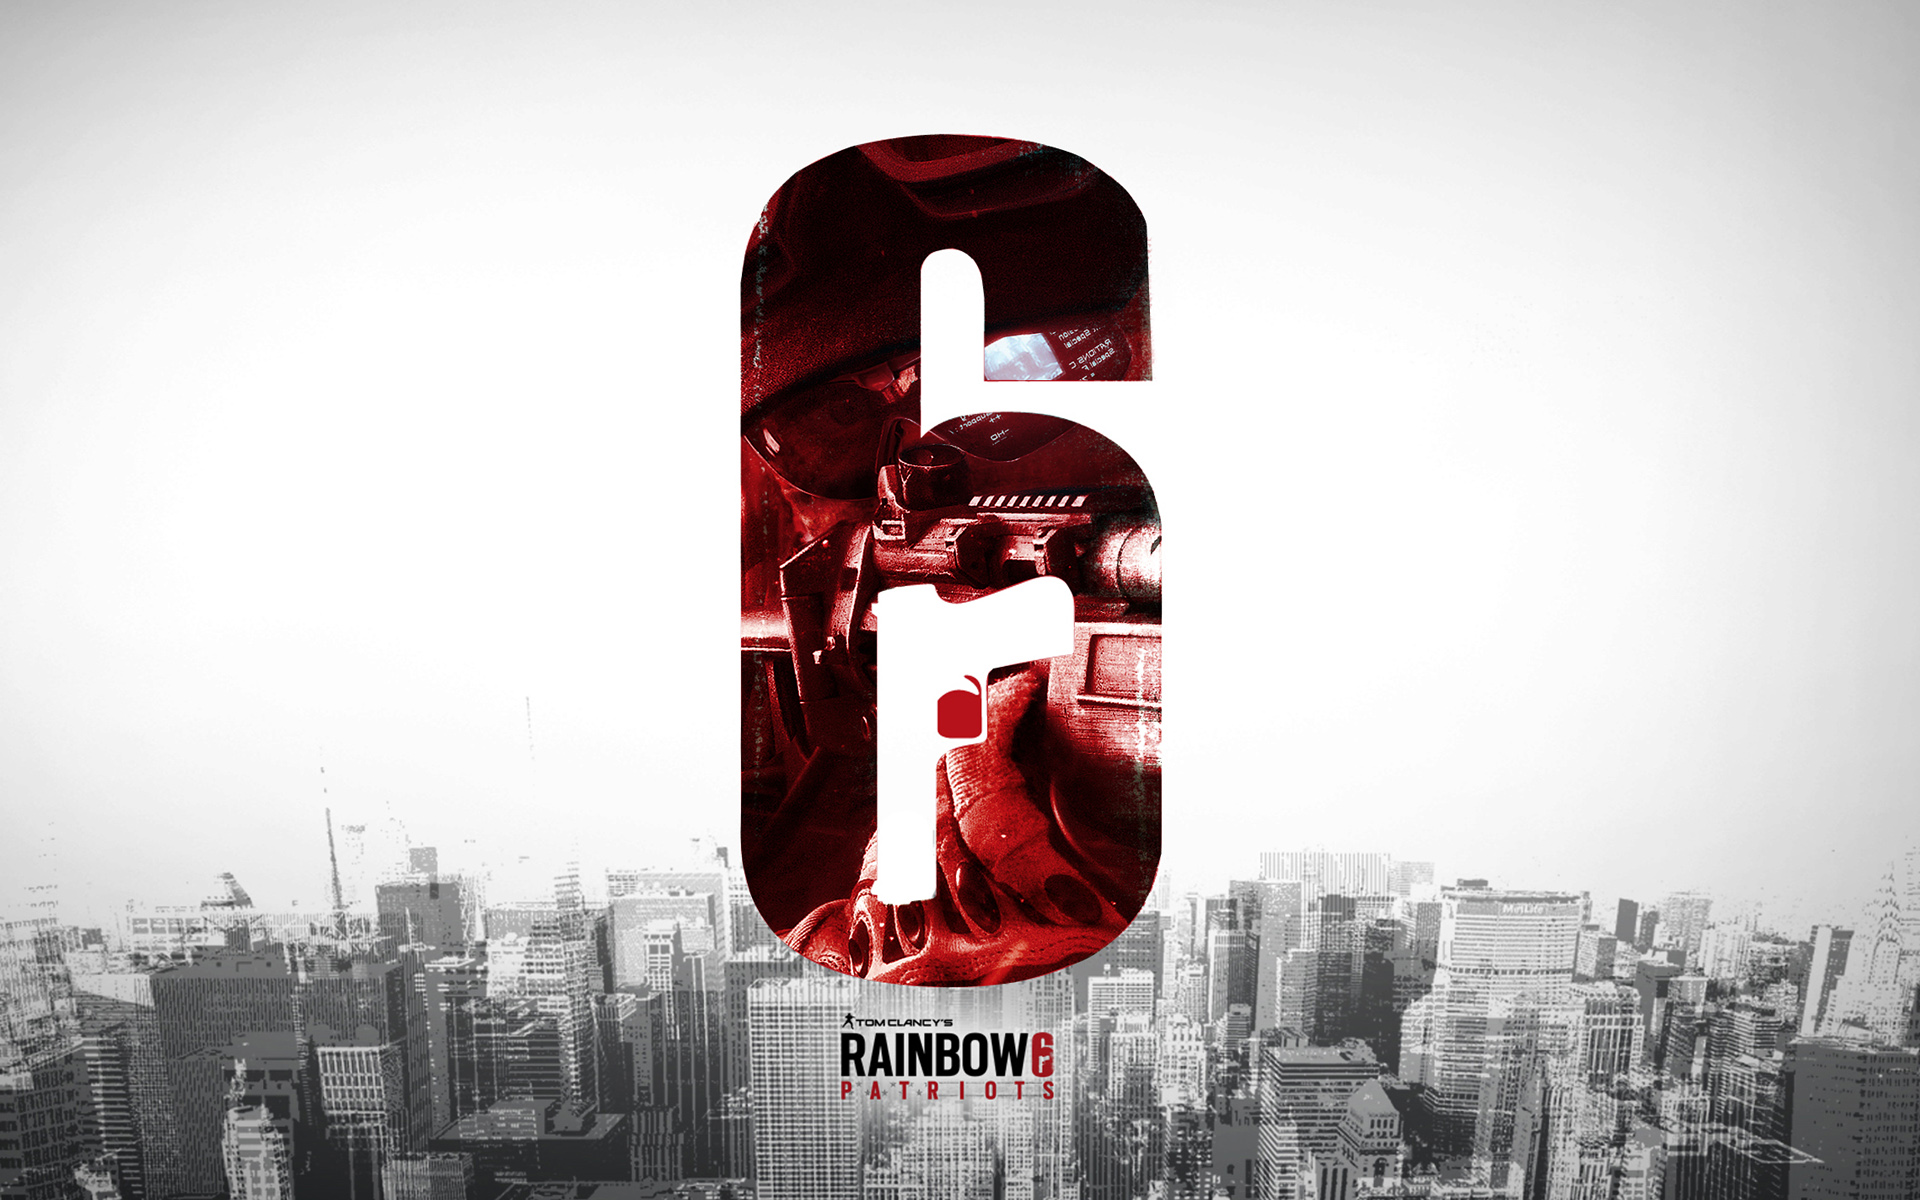 rainbow six patriots hd wallpaper